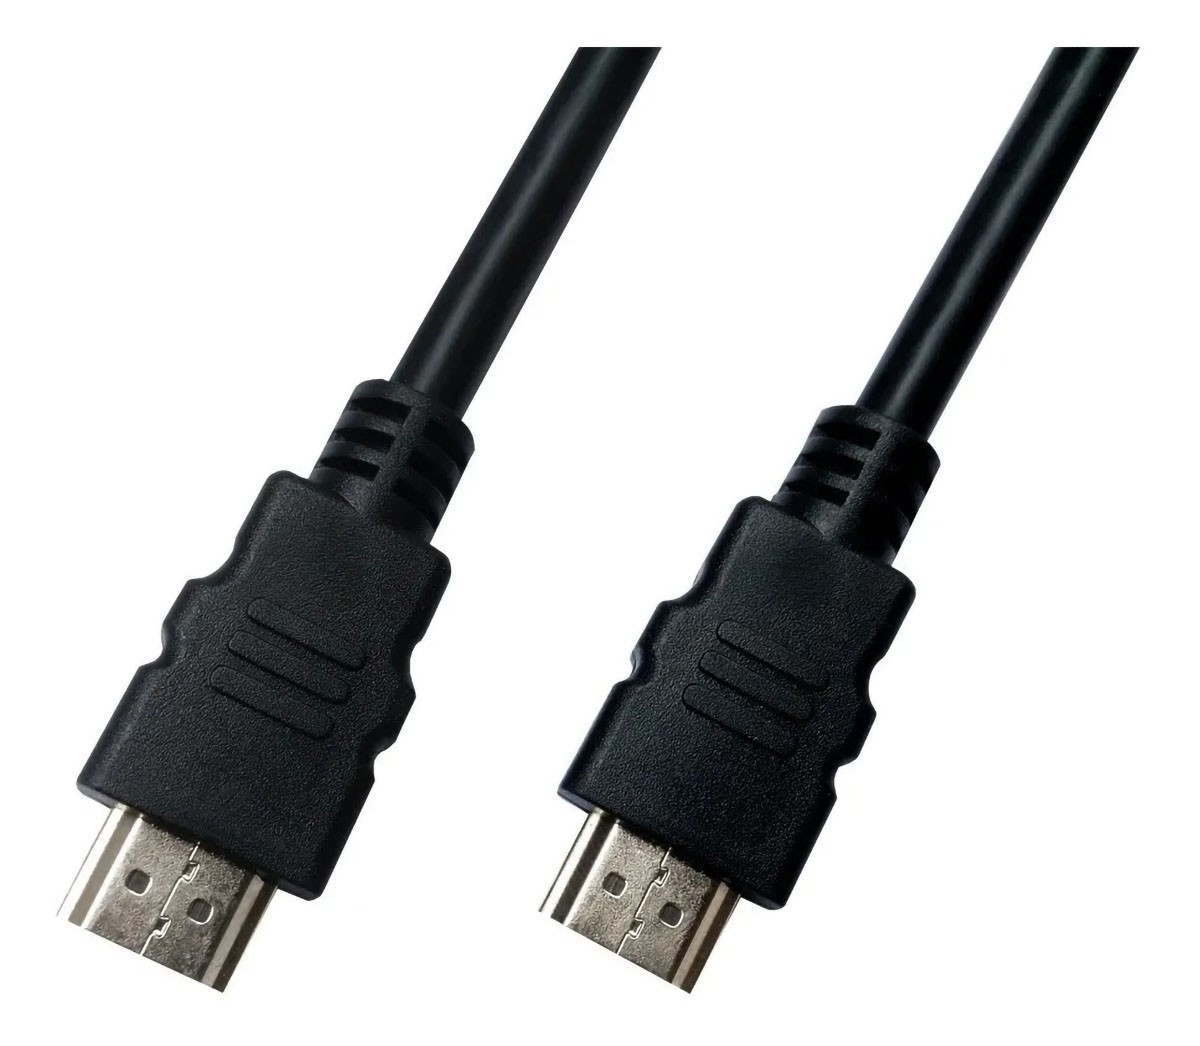 Cabo HDMI 10 Metros Proeletronic CAHD-2010